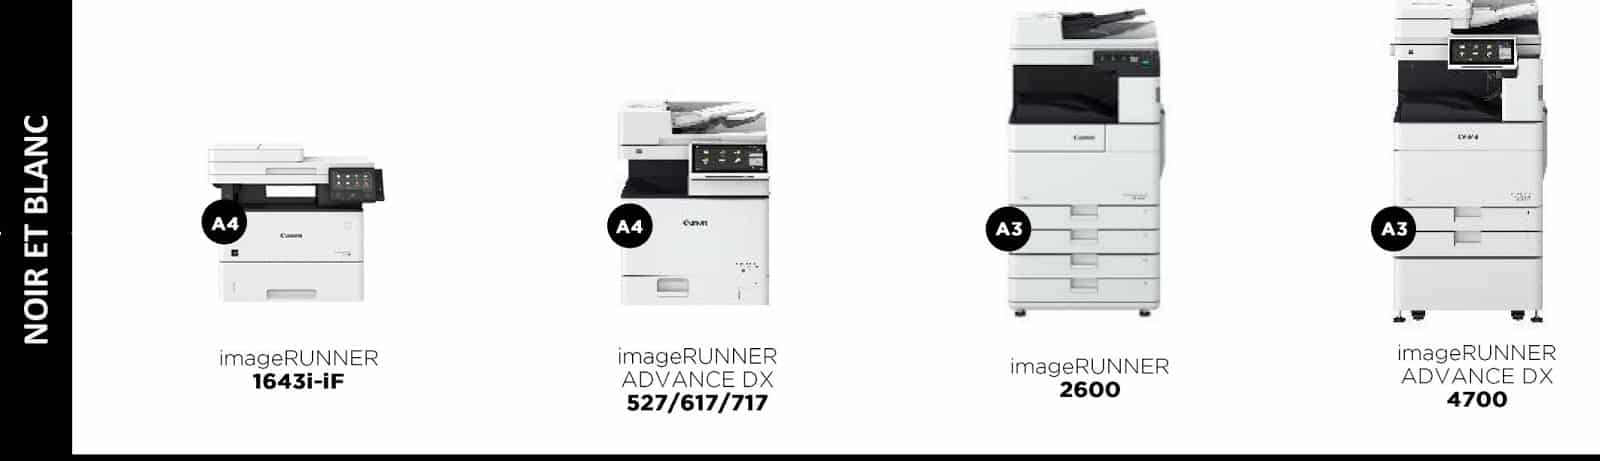 hexacom-impression-best-seller-imprimante-noir-et-blanc